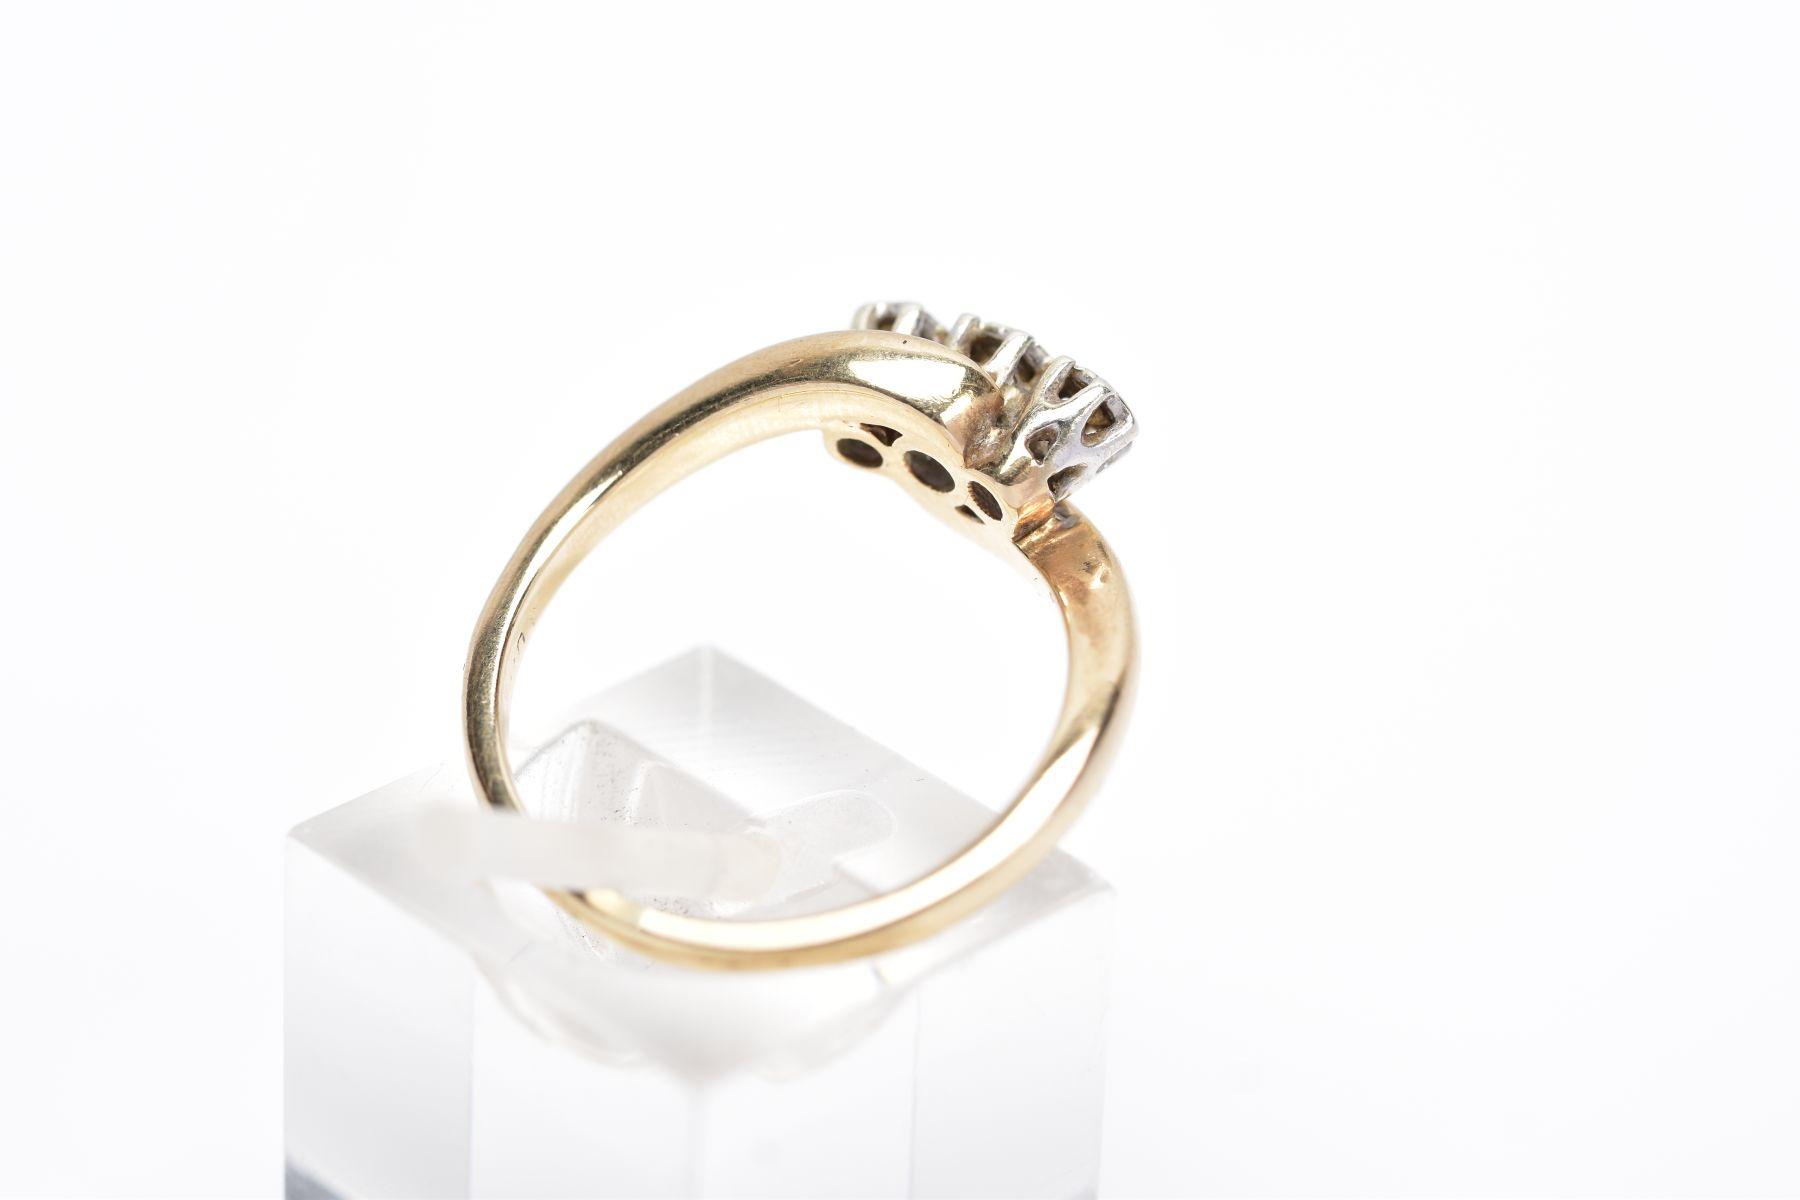 A 9CT GOLD THREE STONE DIAMOND RING, designed with three graduated round brilliant cut diamonds, - Image 3 of 4